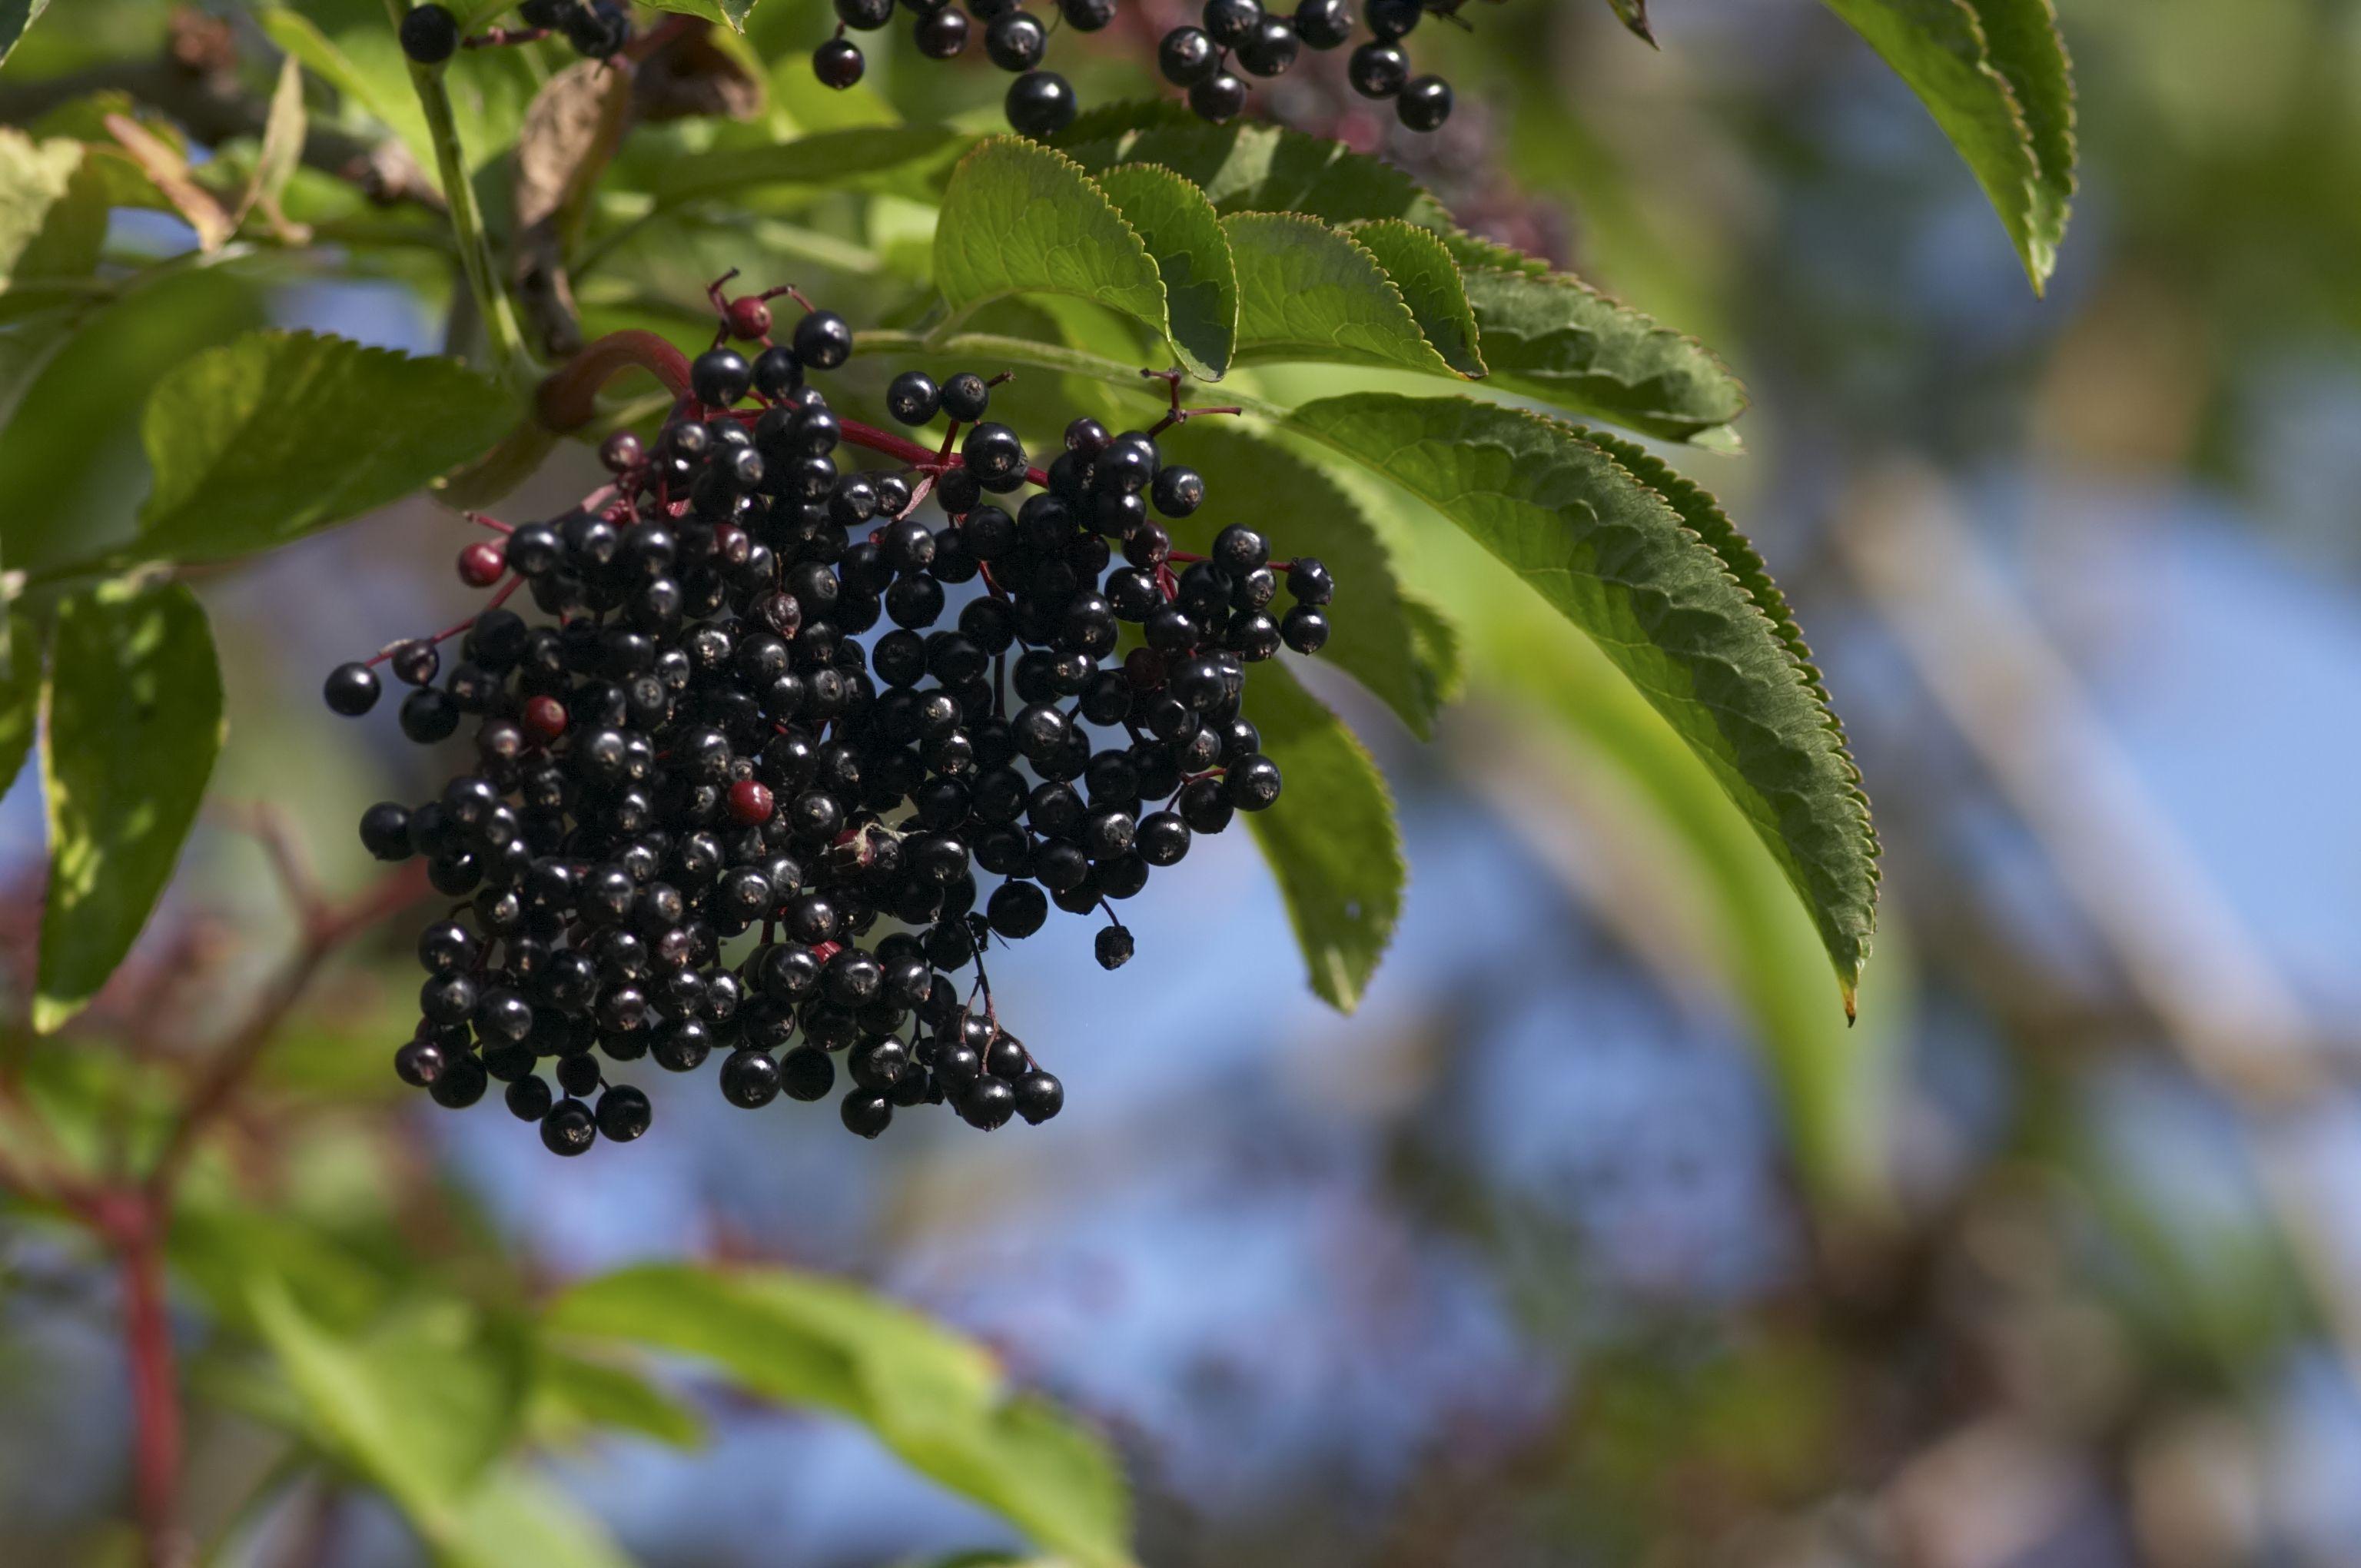 Hanging cluster of black elderberries Sambucus nigra